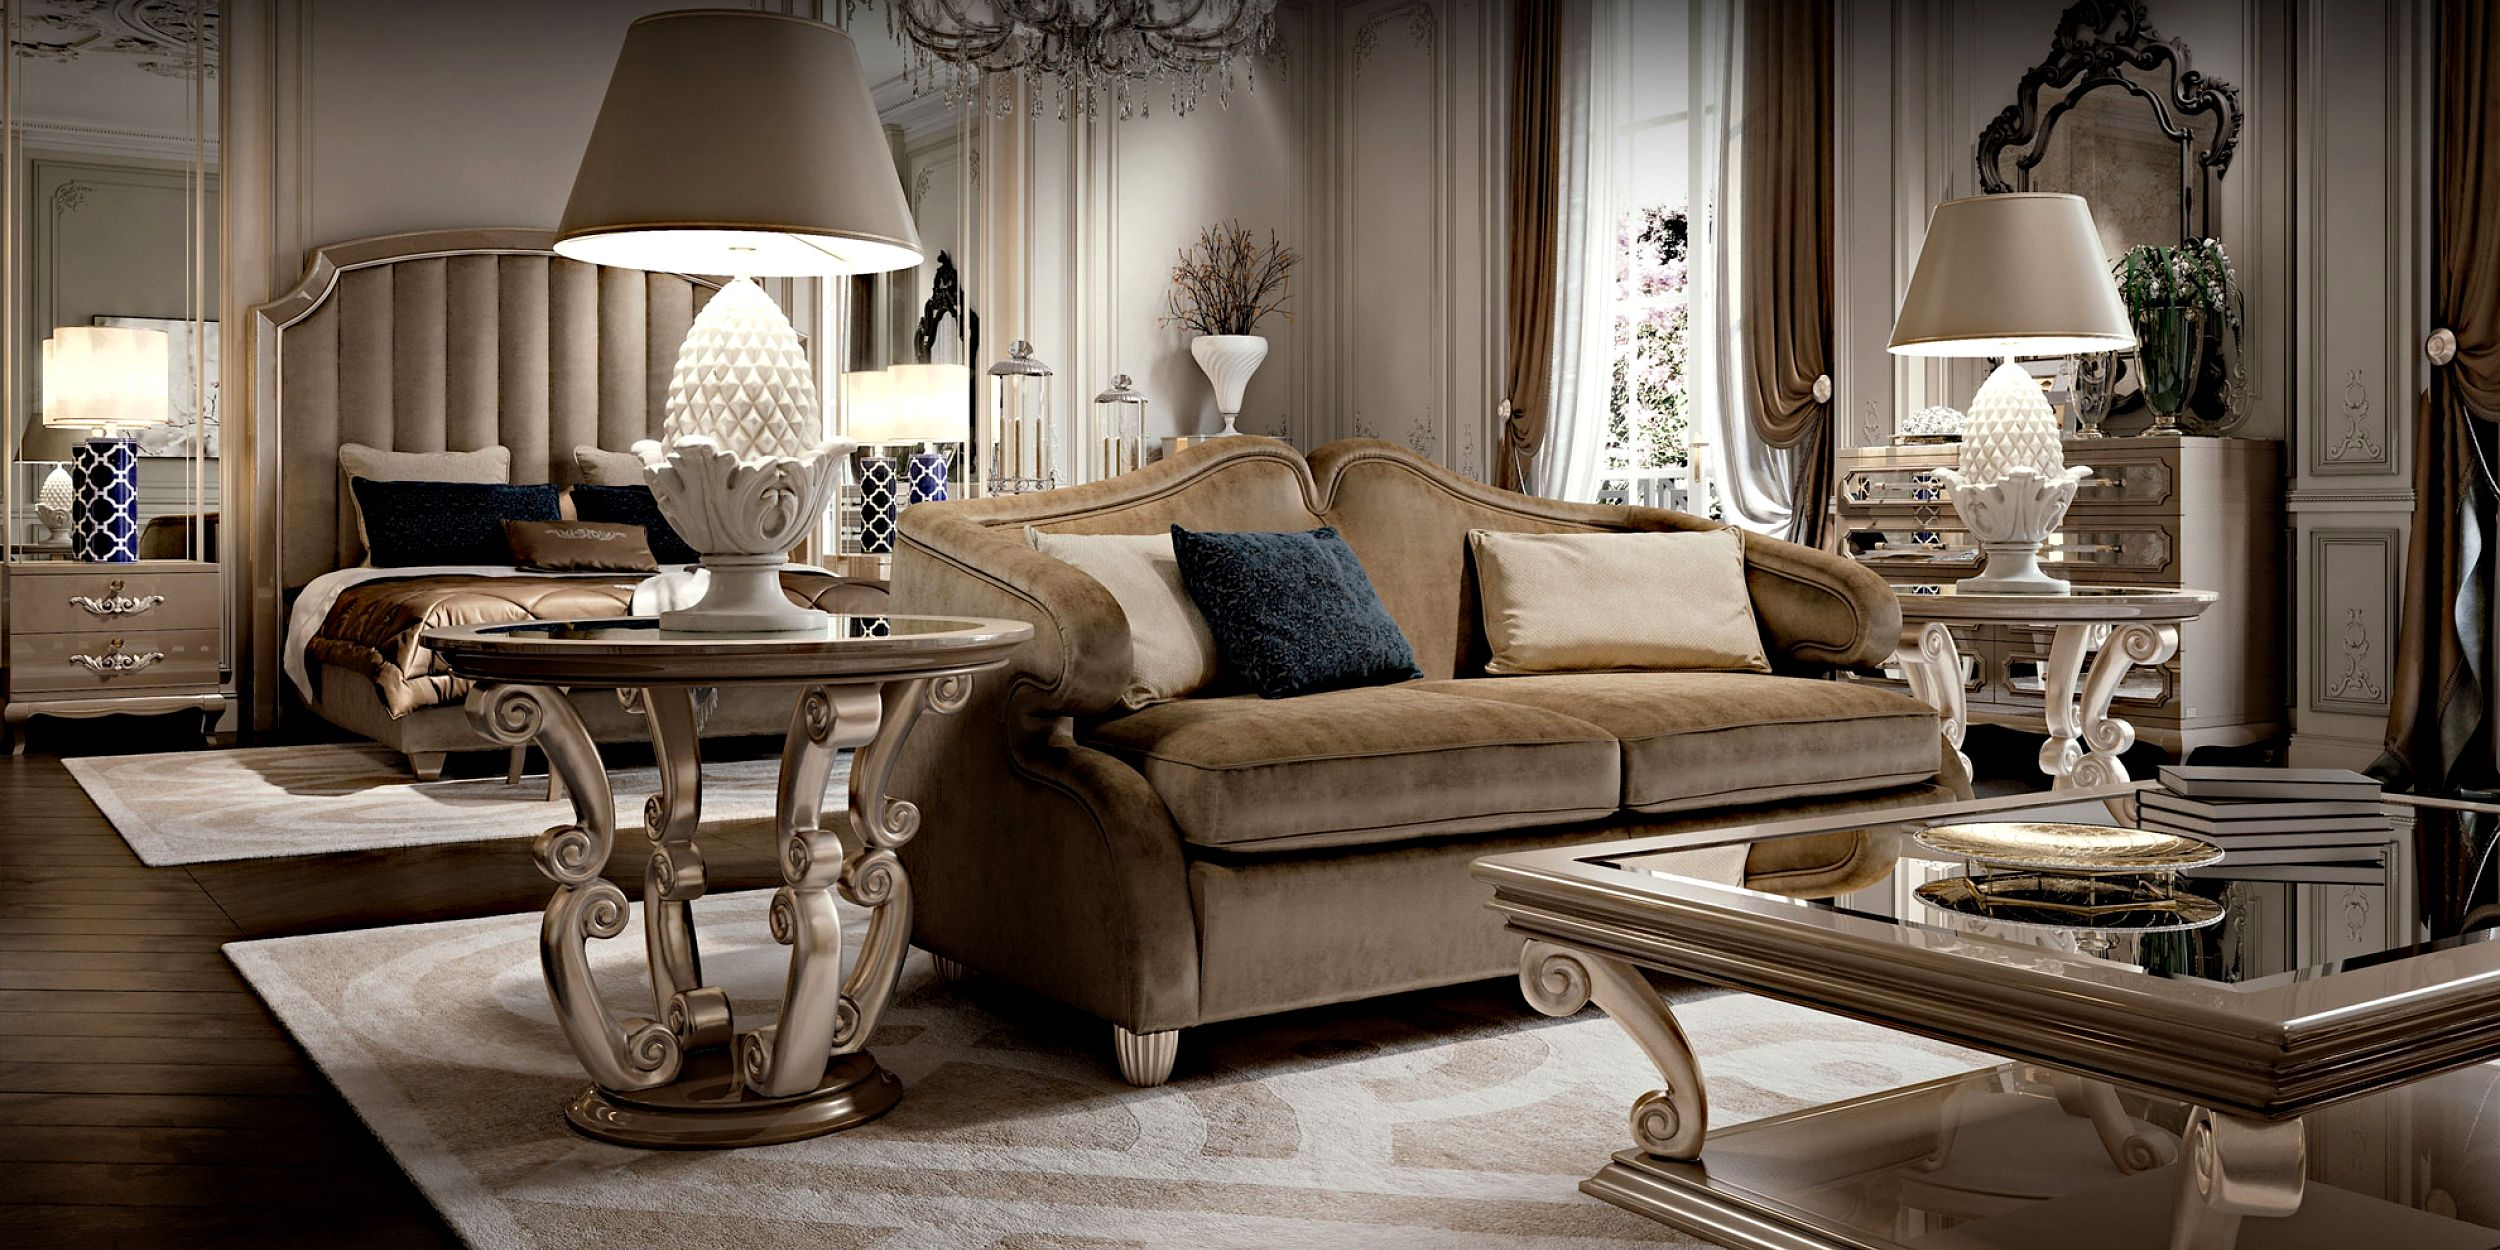 Classic Design Italia Mobili.Cavio Casa Contemporary Italian Furniture Interior Design